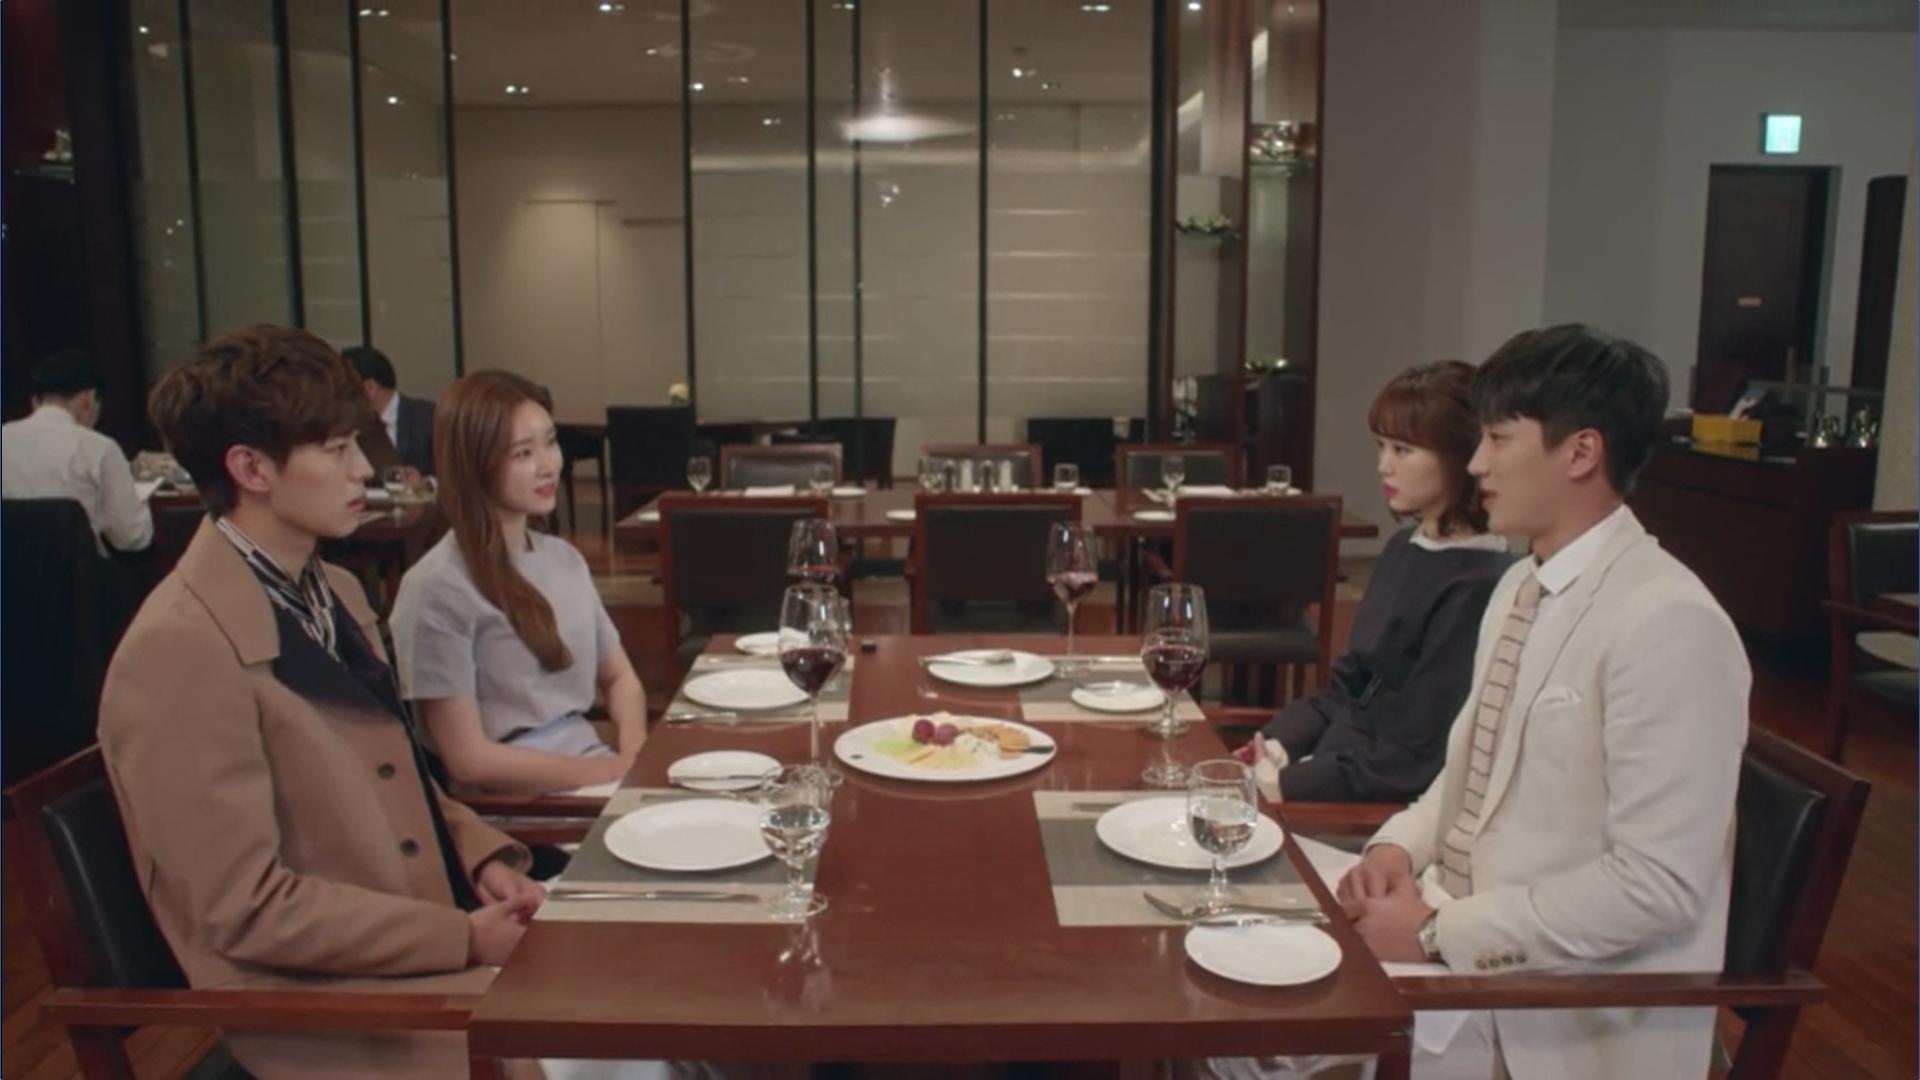 Wednesday 3:30 PM Yoon Jae-won, Seon Eun-woo, Baek Seung-gyu, and Gong Na-yeon at dinner